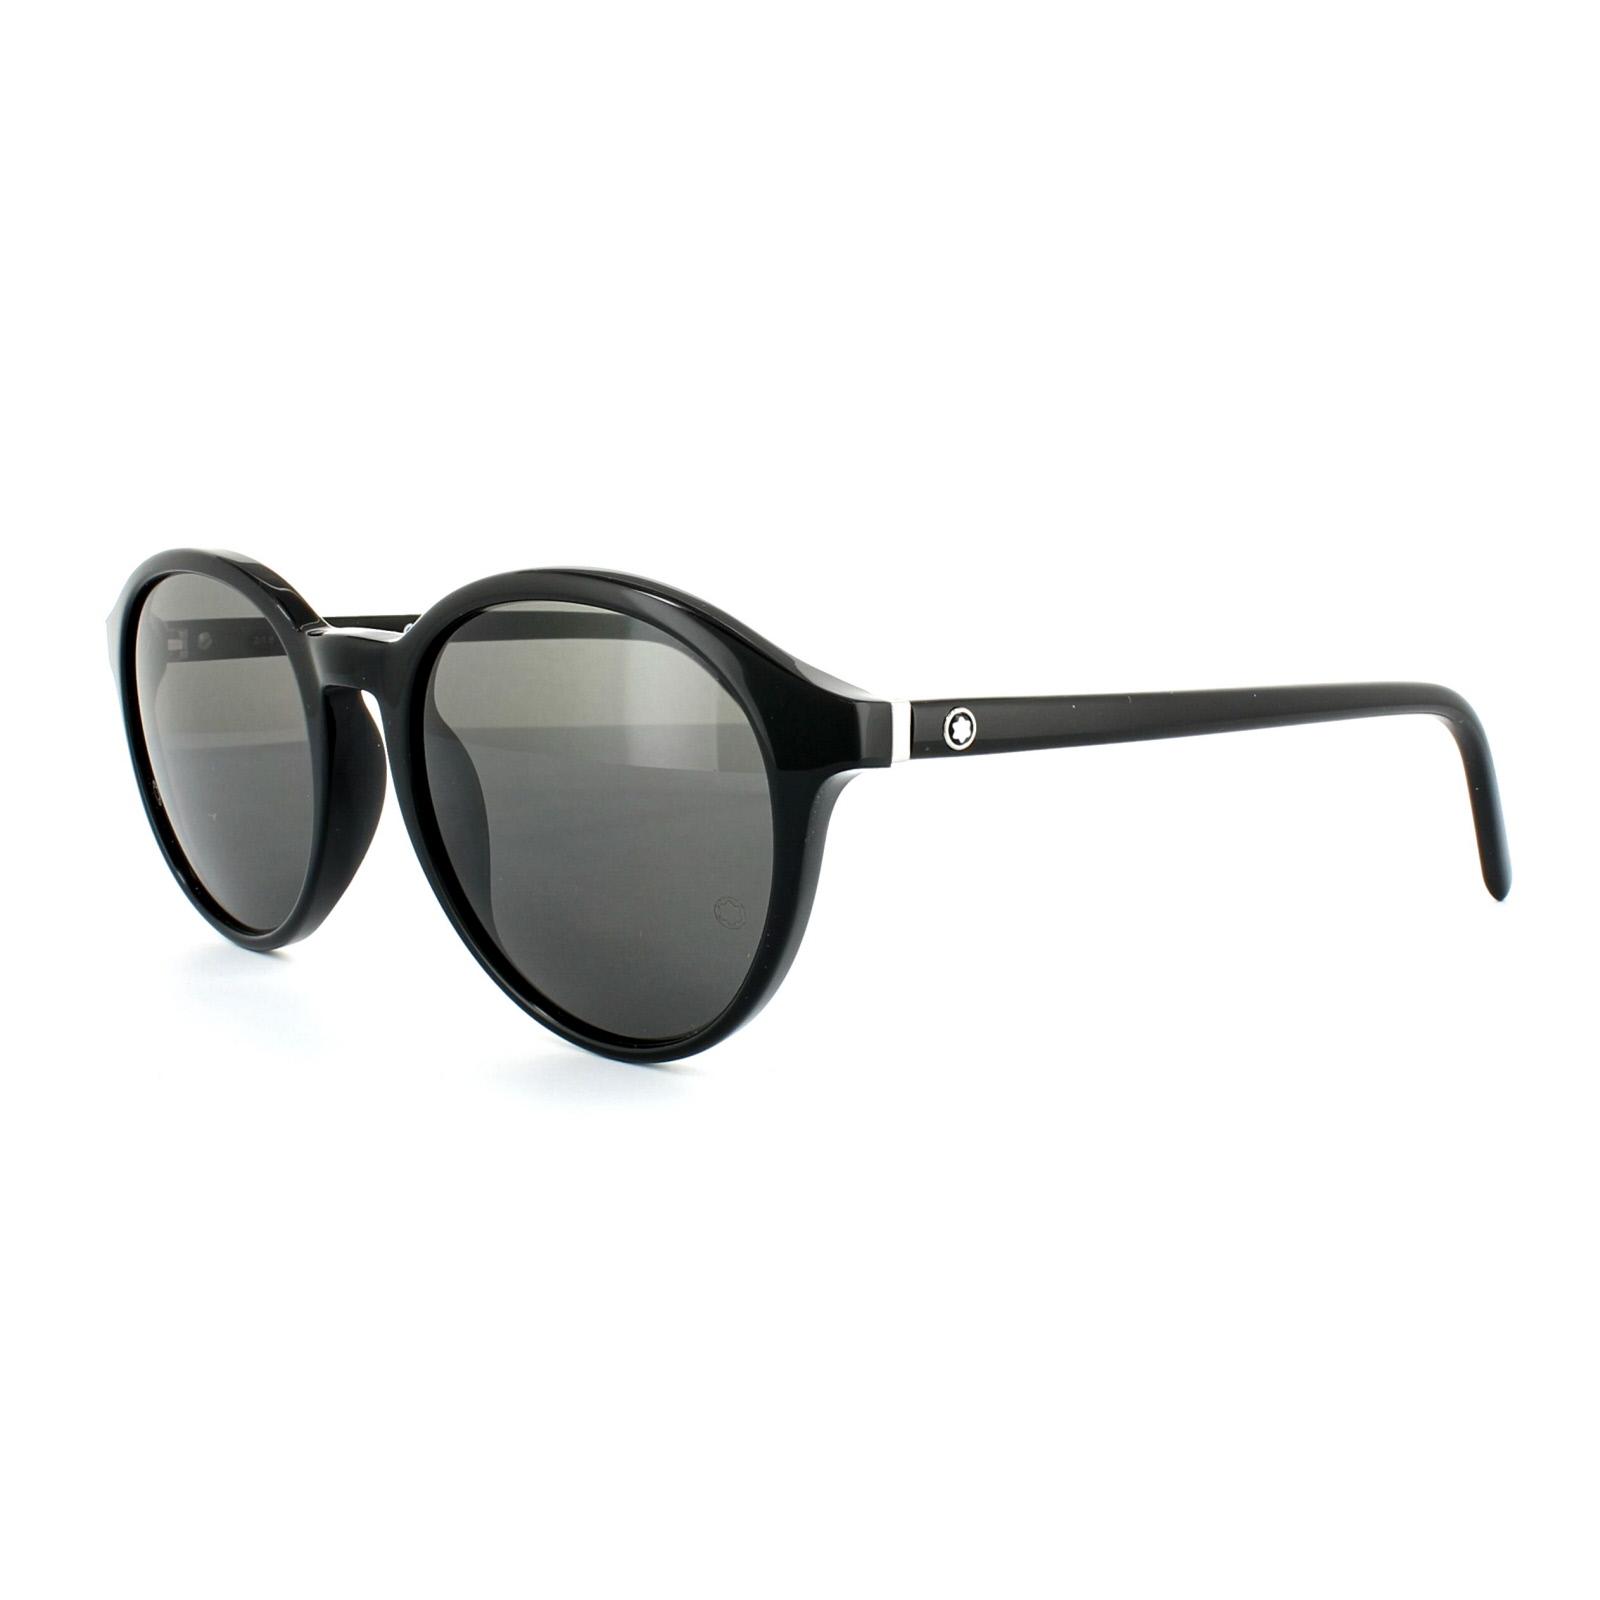 8591551d58 Sentinel Mont Blanc Sunglasses MB505S 01B Shiny Black Dark Grey Smoke